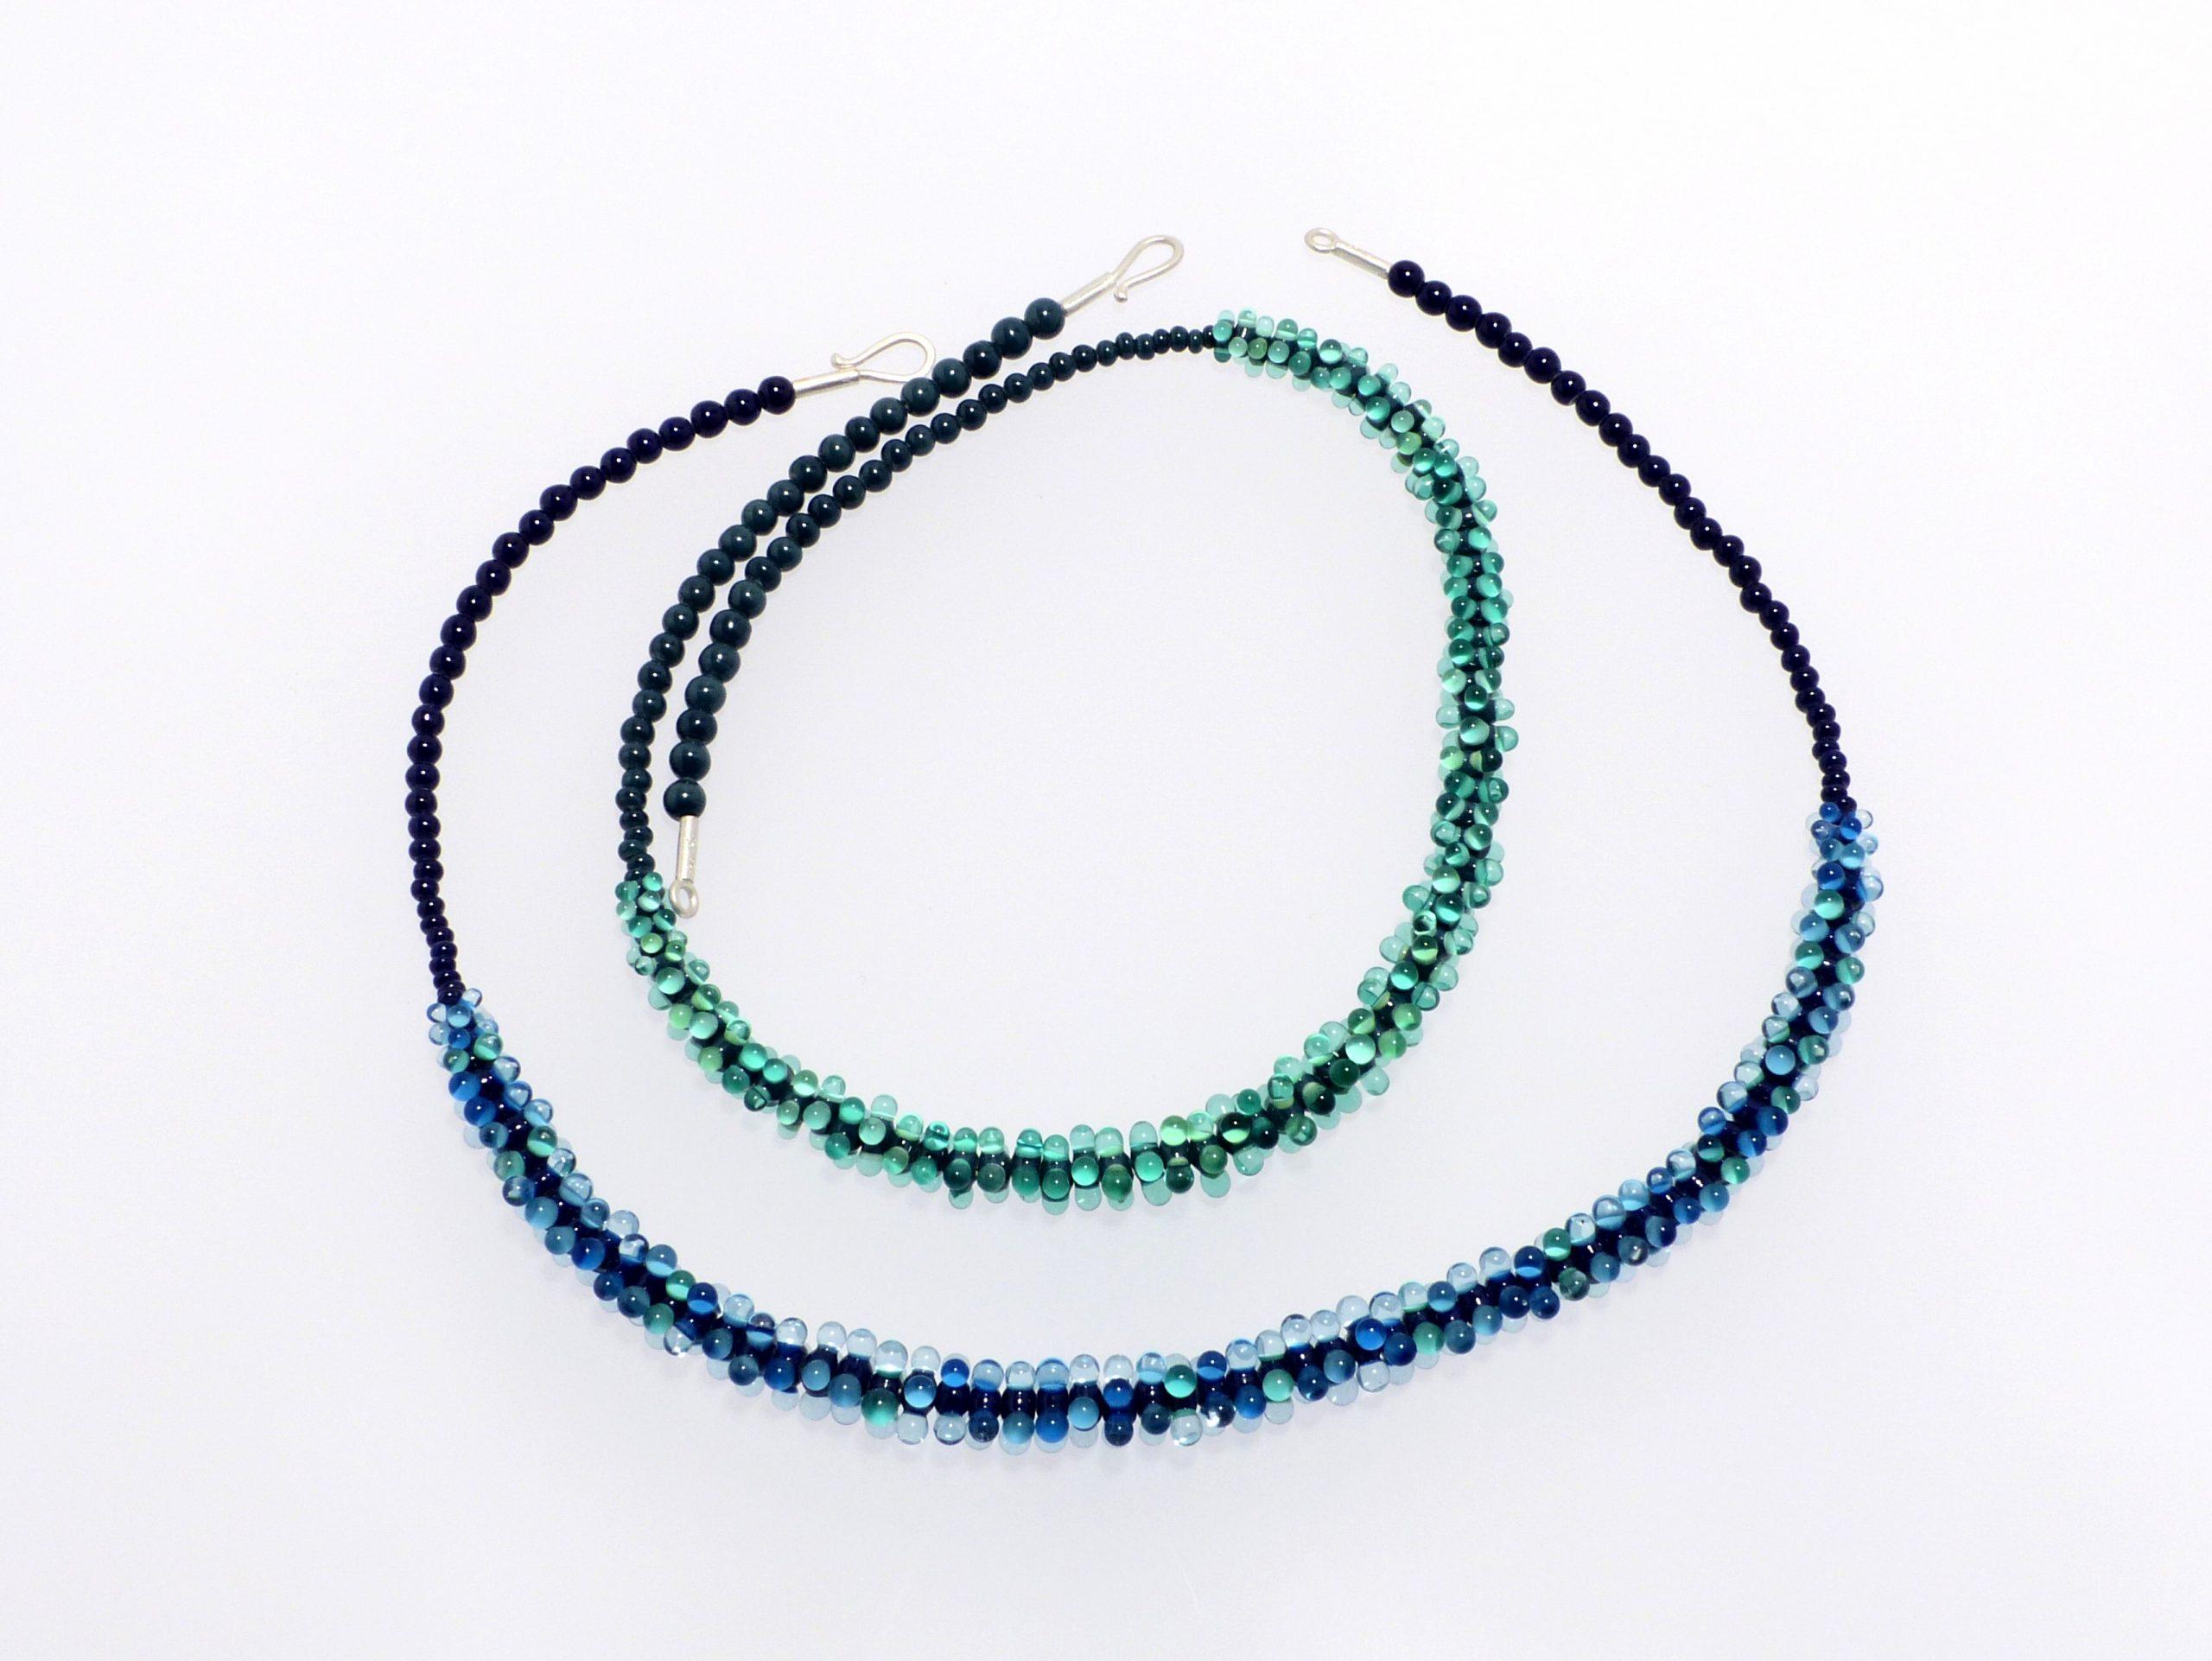 Glanz kompakt 3 farbig, türkis und blau | Glas, Stahlseil, Silber | 120996-20